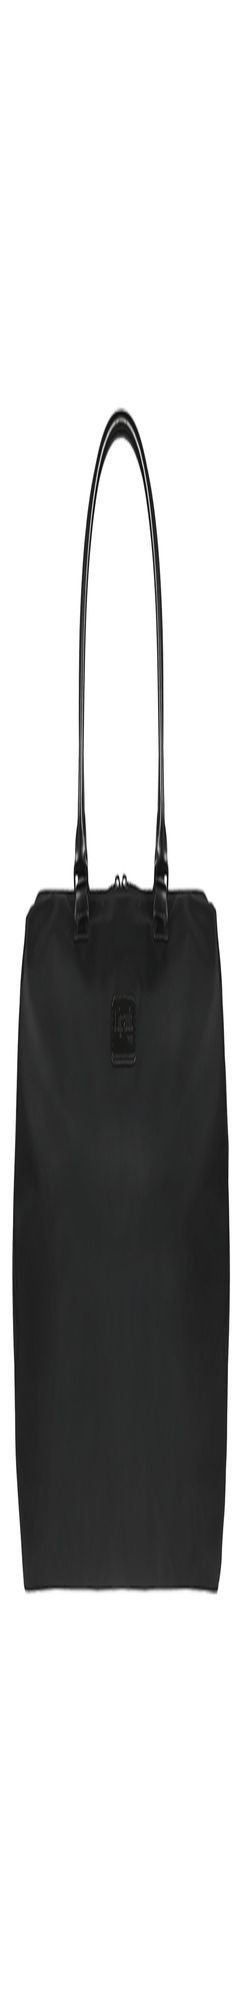 Сумка женская M Lady Plume, черная фото